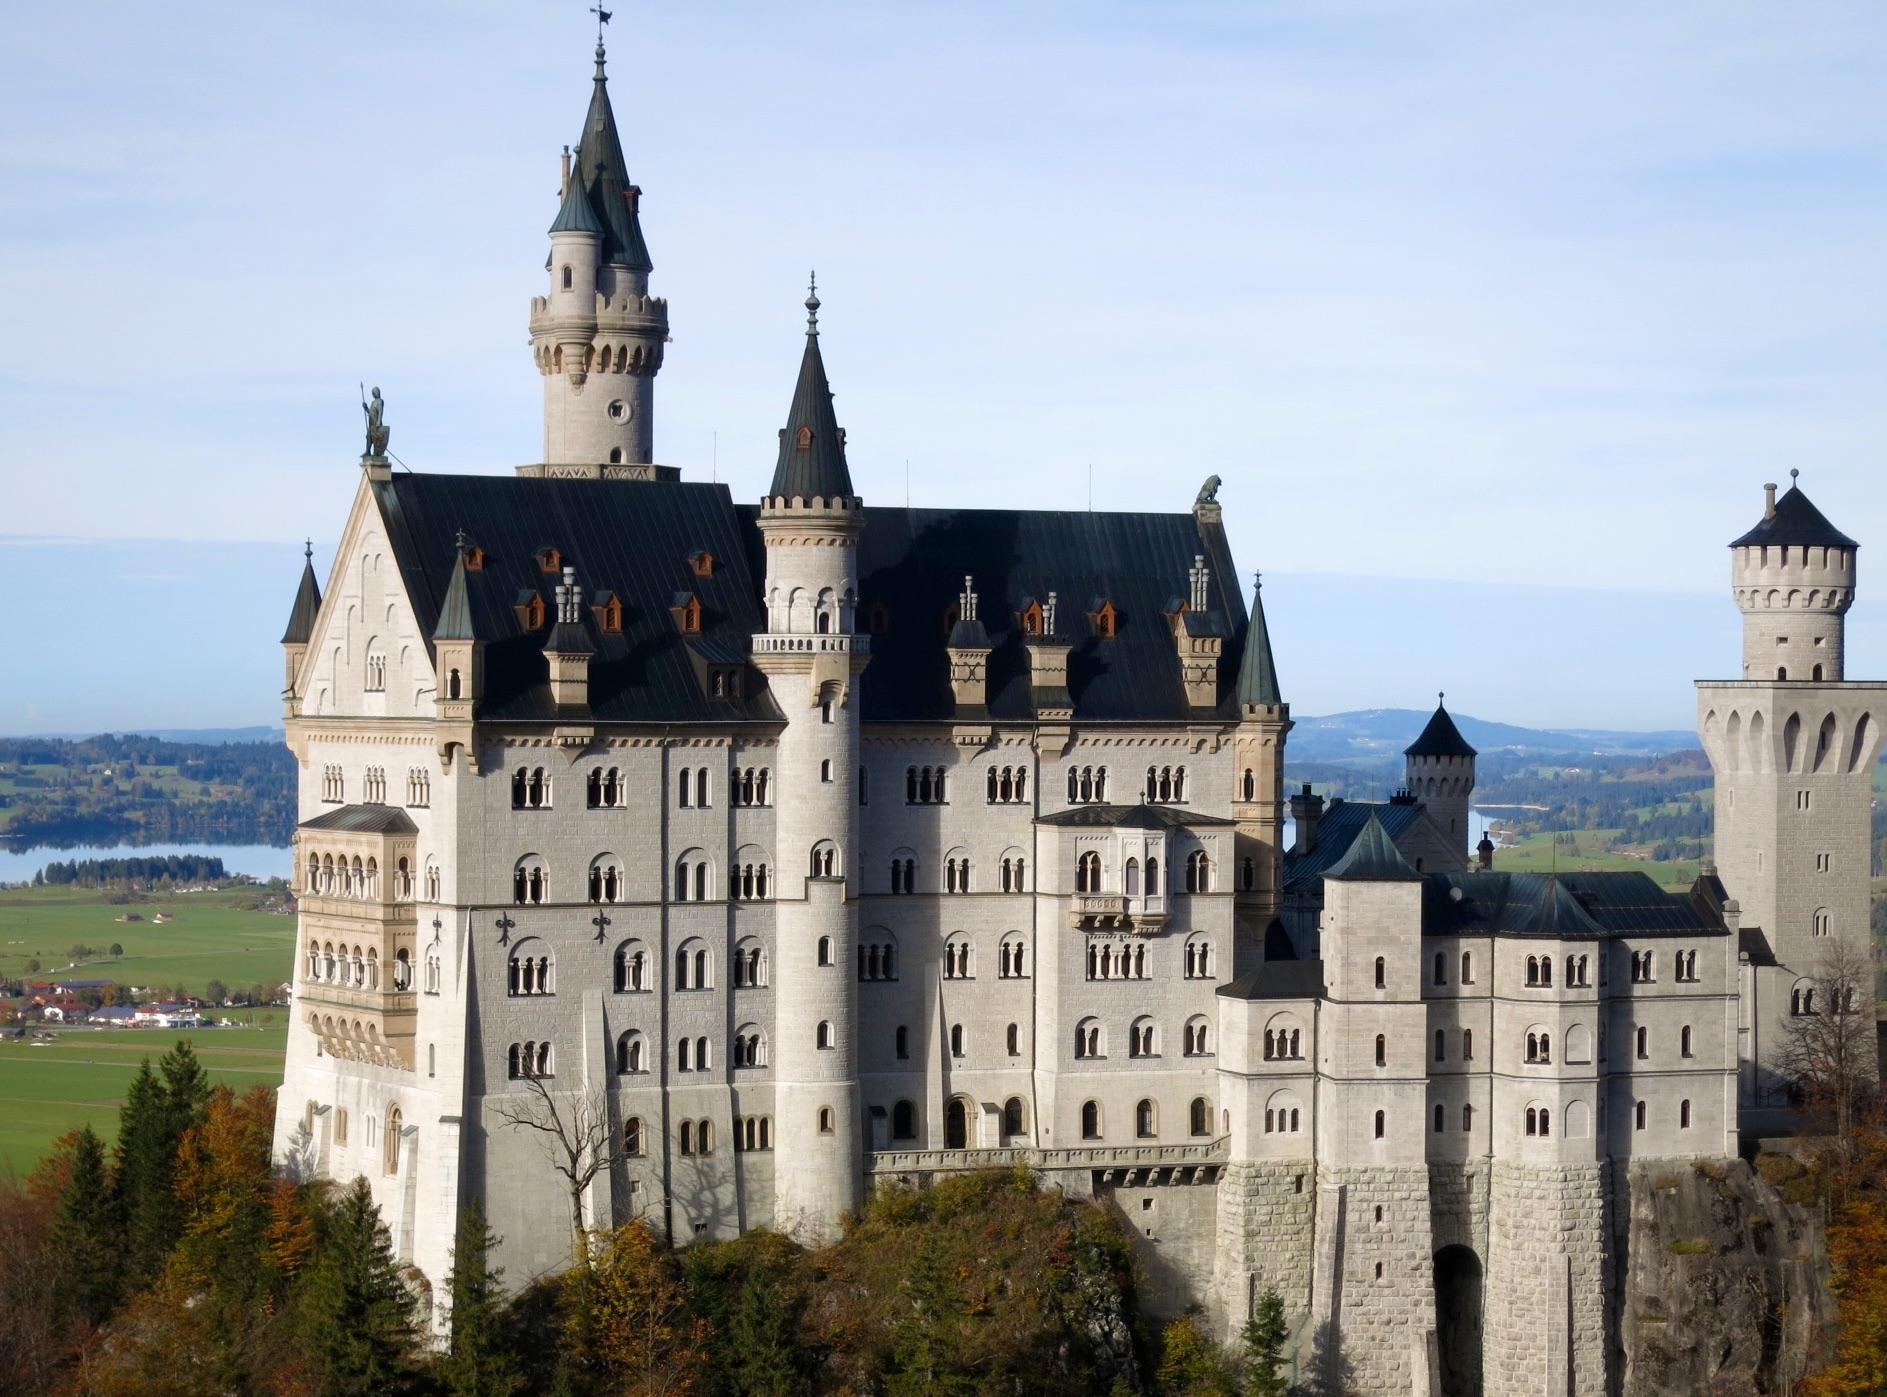 Ludwig's Fairytale Castle.